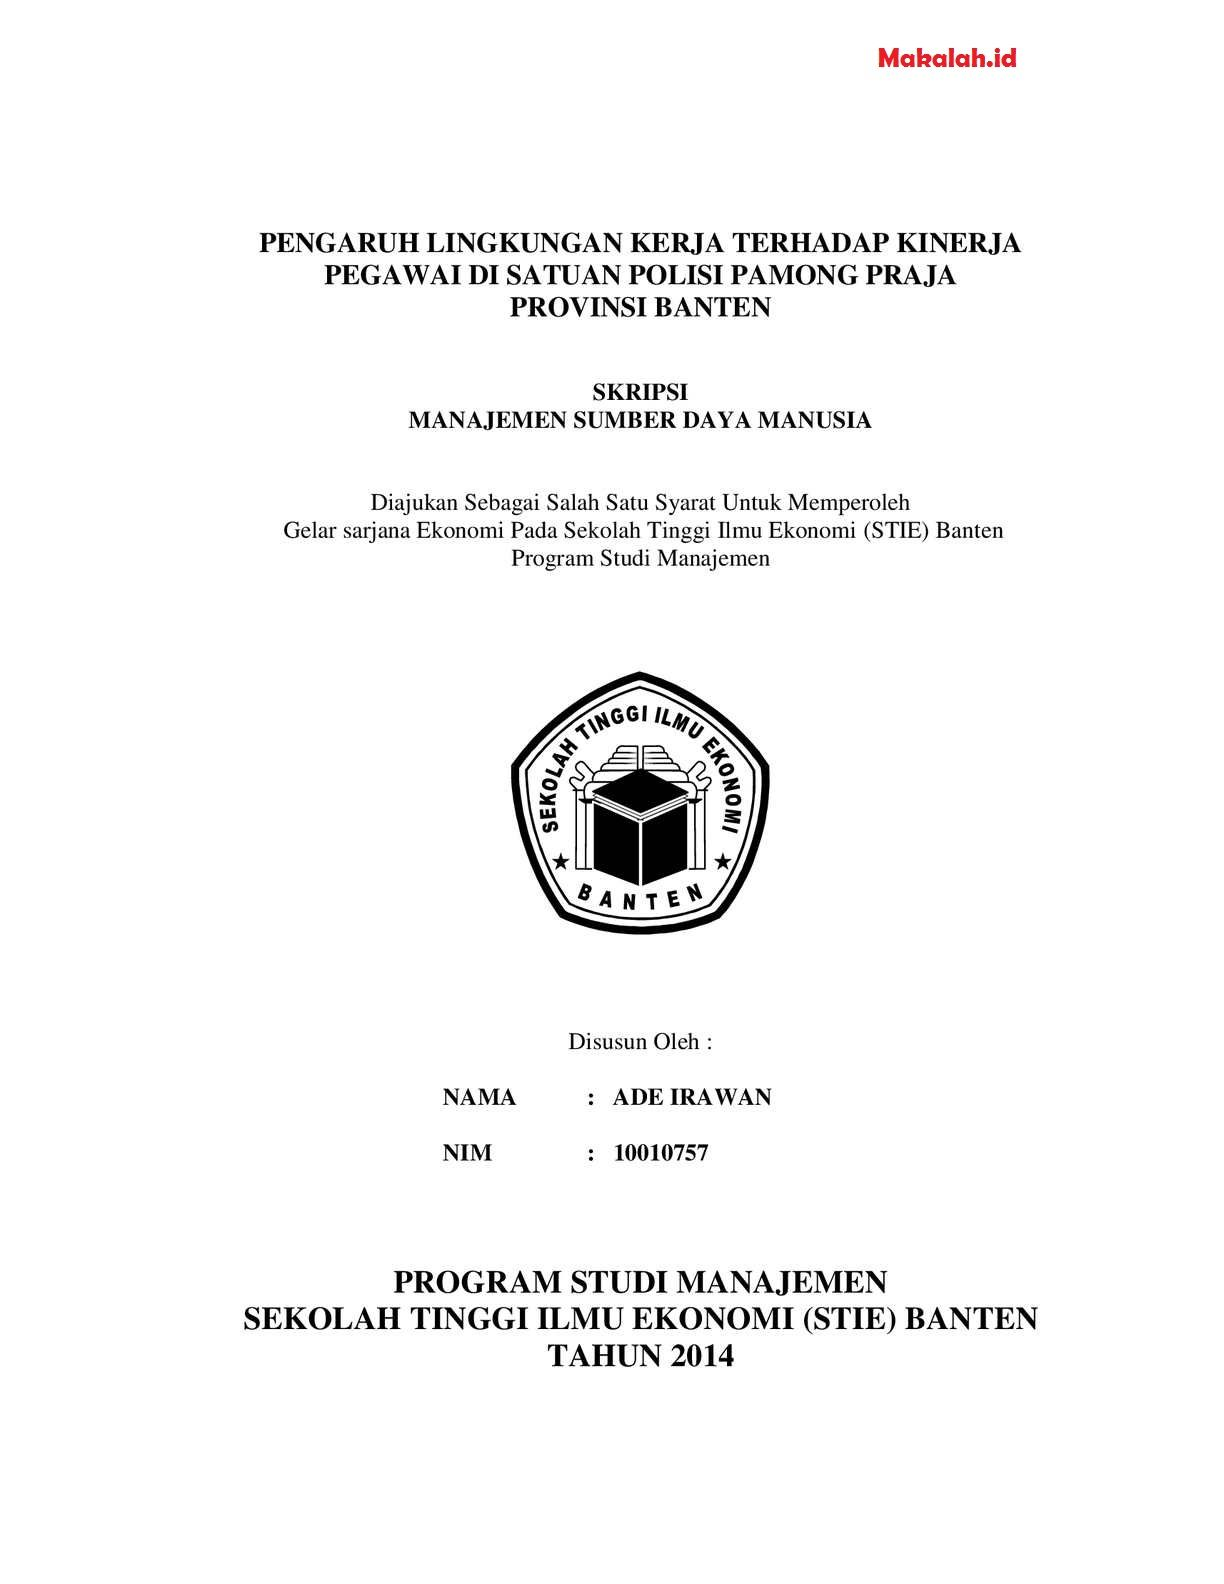 Skripsi Fakultas Ekonomi Jurusan Manajemen Sdm